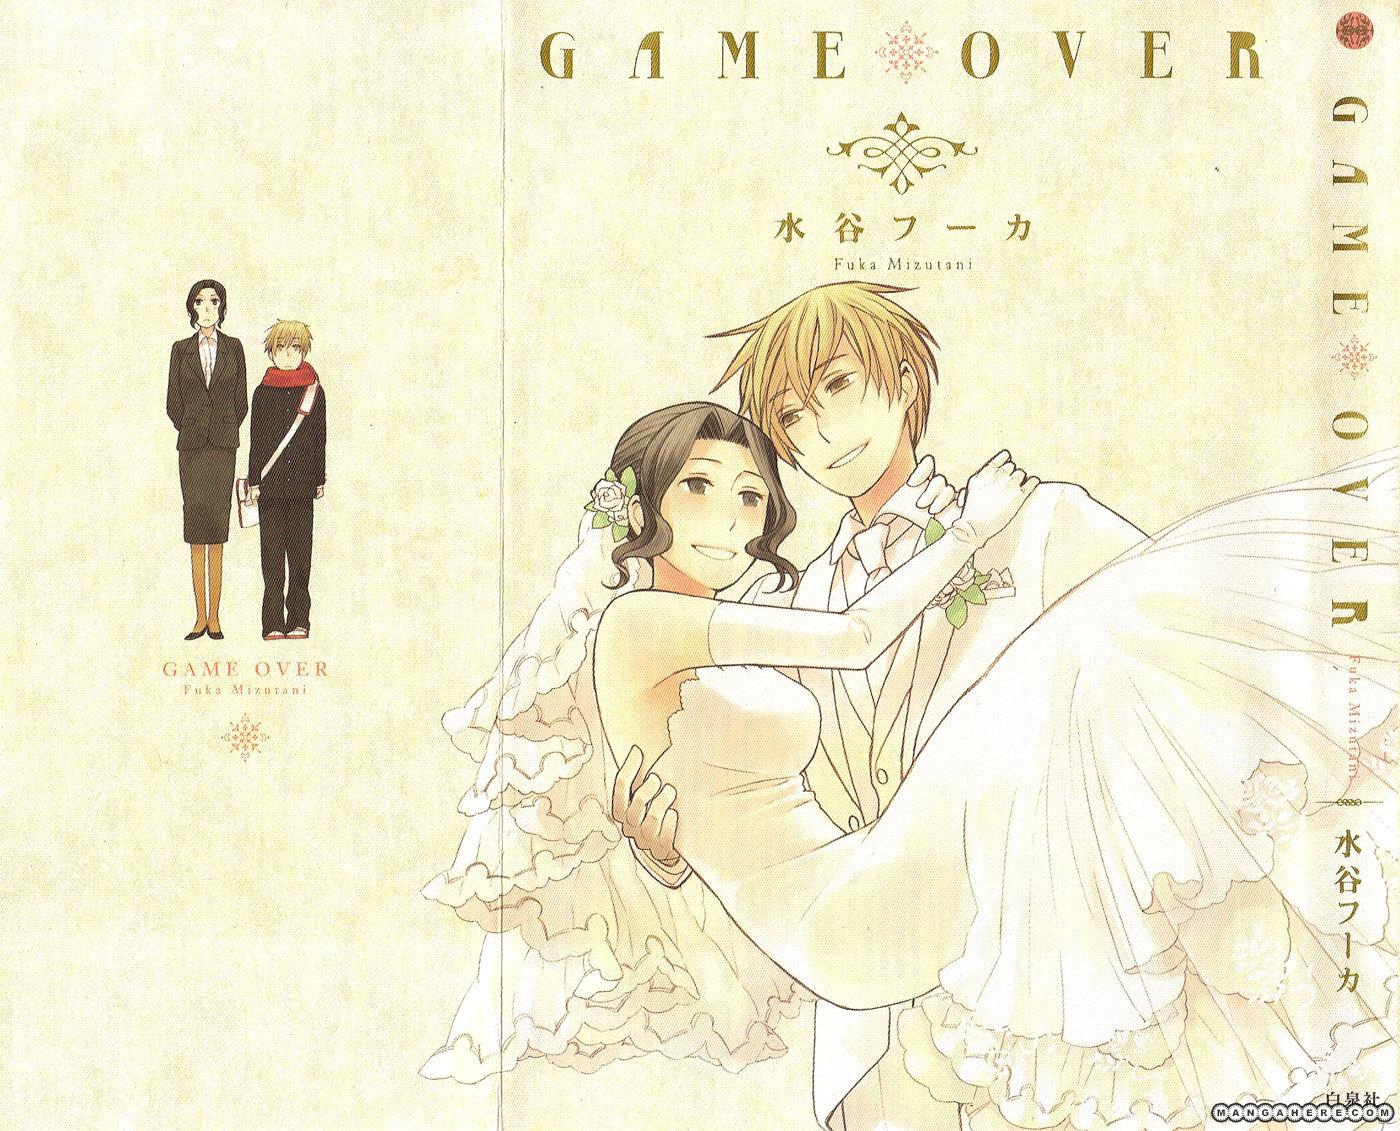 Game Over (MIZUTANI Fuka) 0.1 Page 1